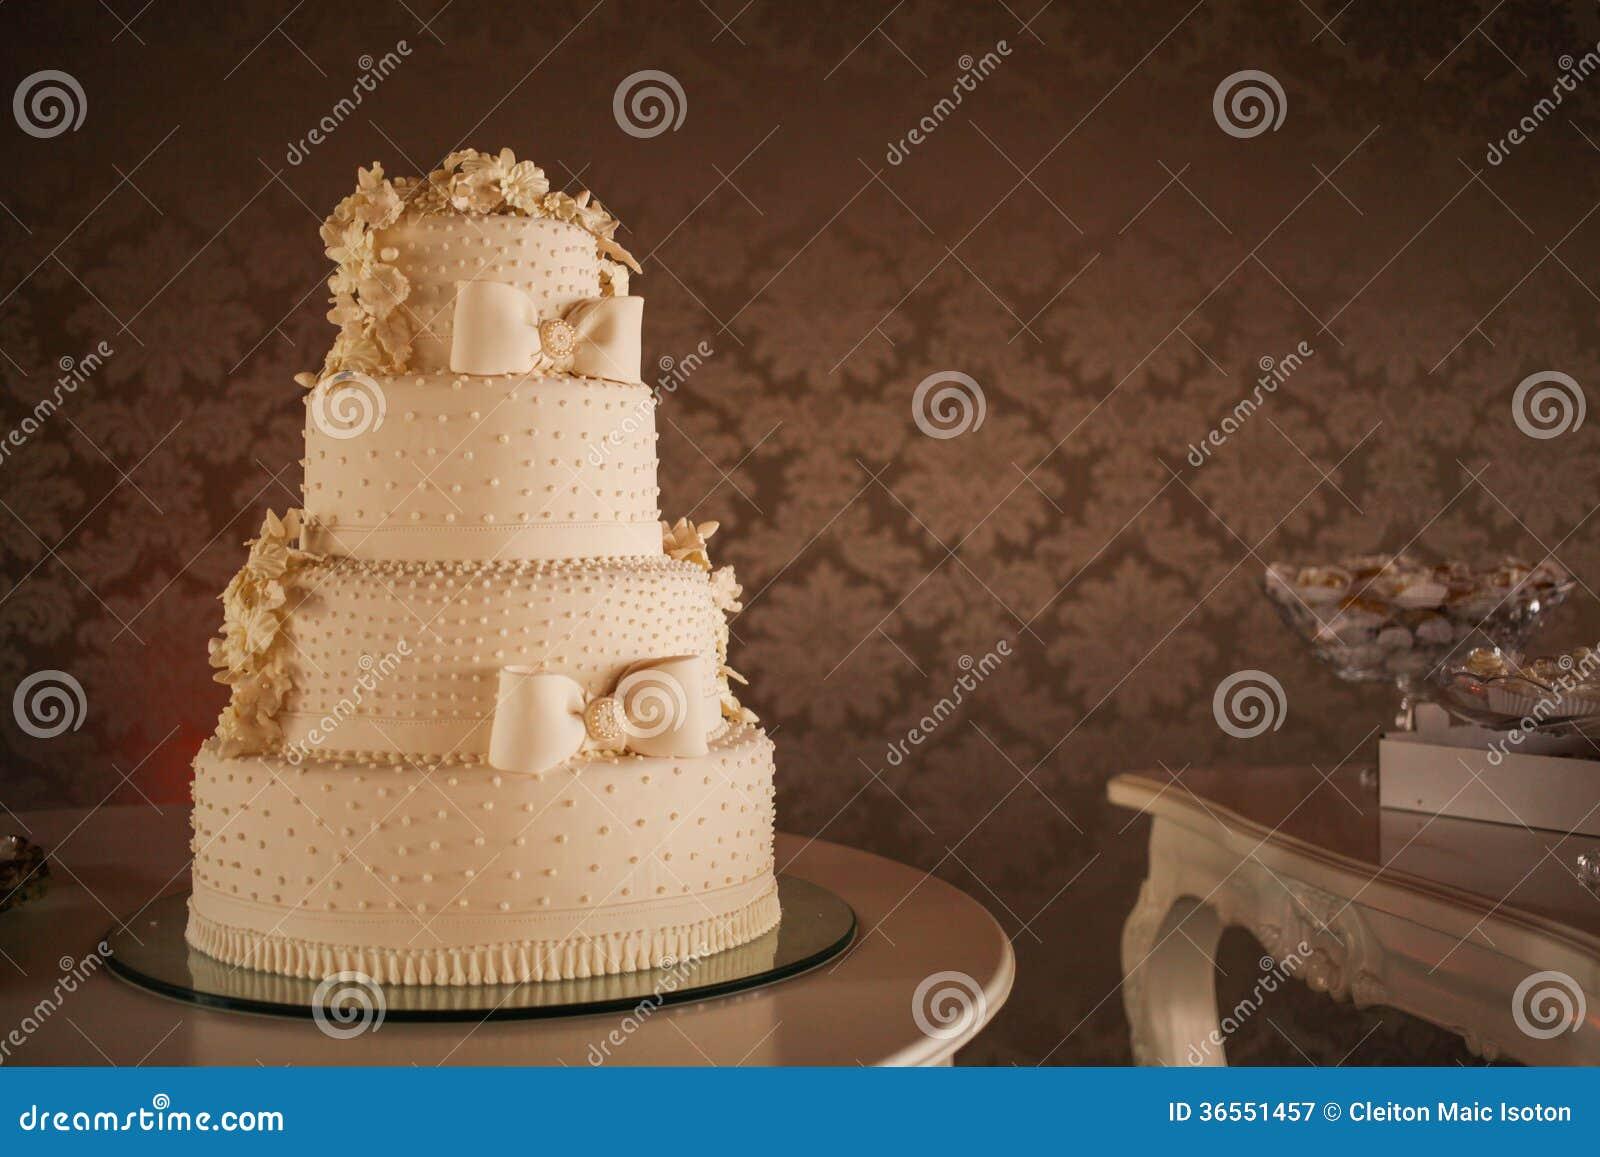 Wedding Cake Royalty Free Stock graphy Image